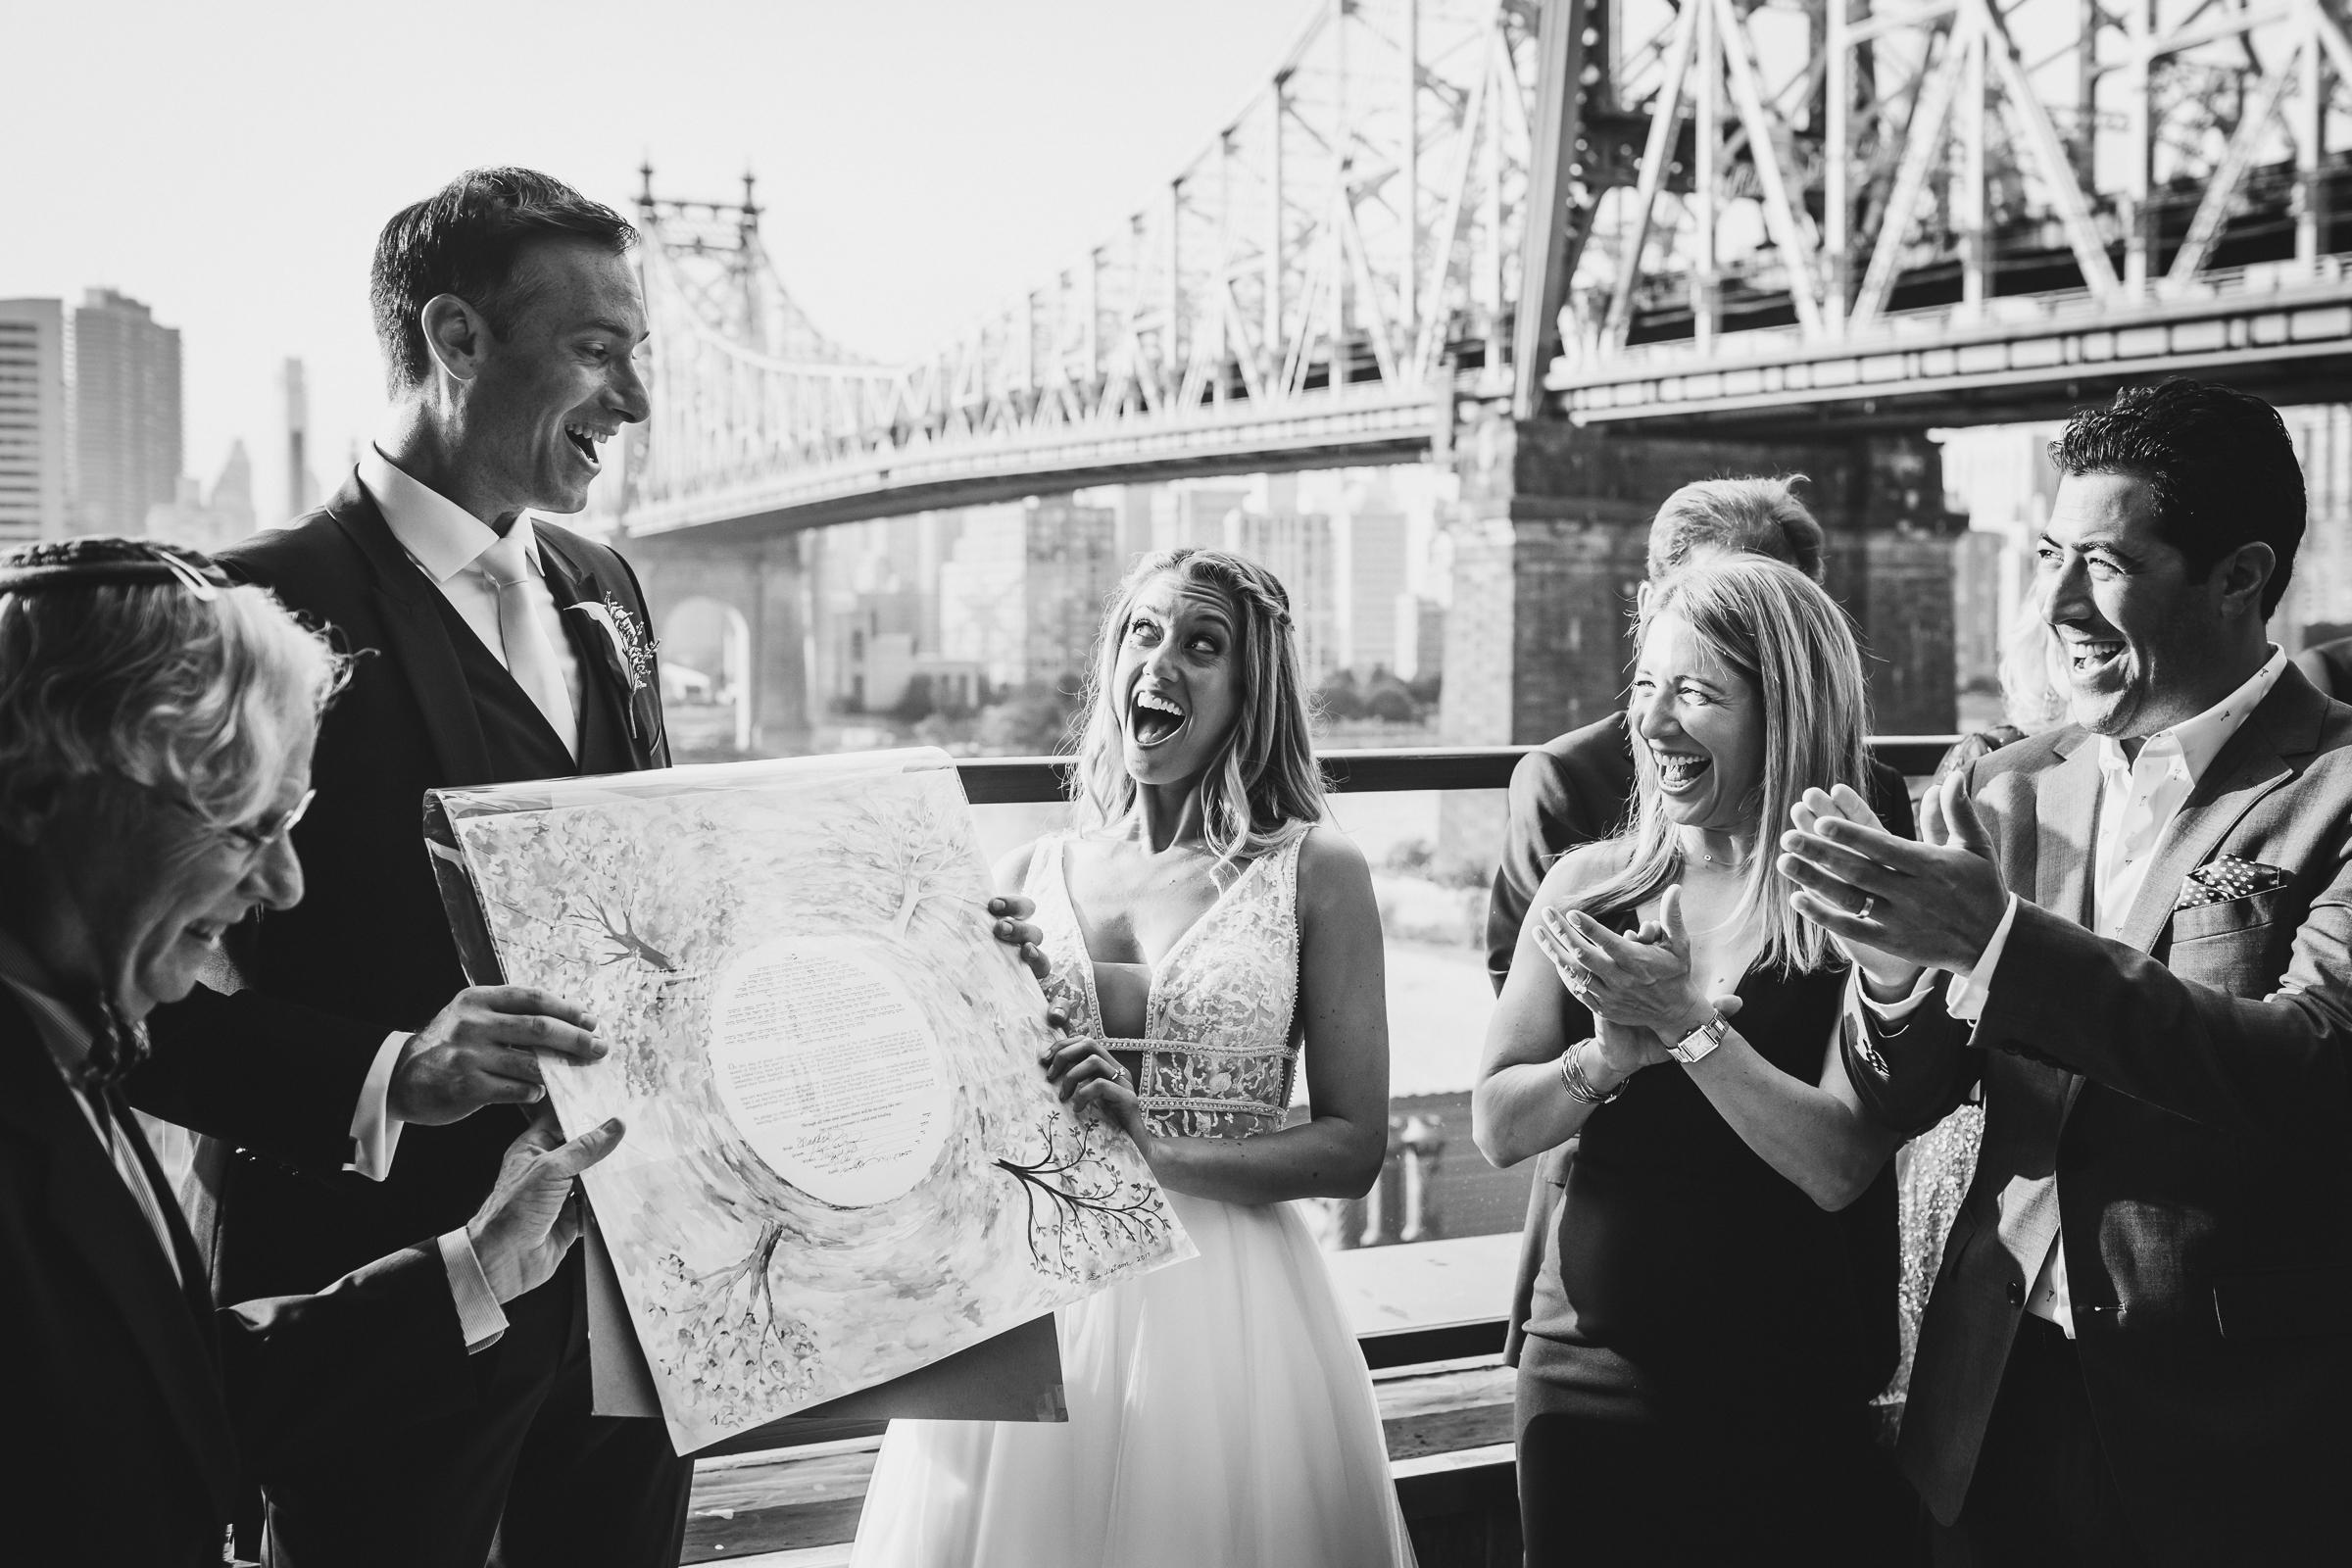 Ravel-Hotel-Penthouse-808-Long-Island-City-New-York-Documentary-Wedding-Photographer-53.jpg